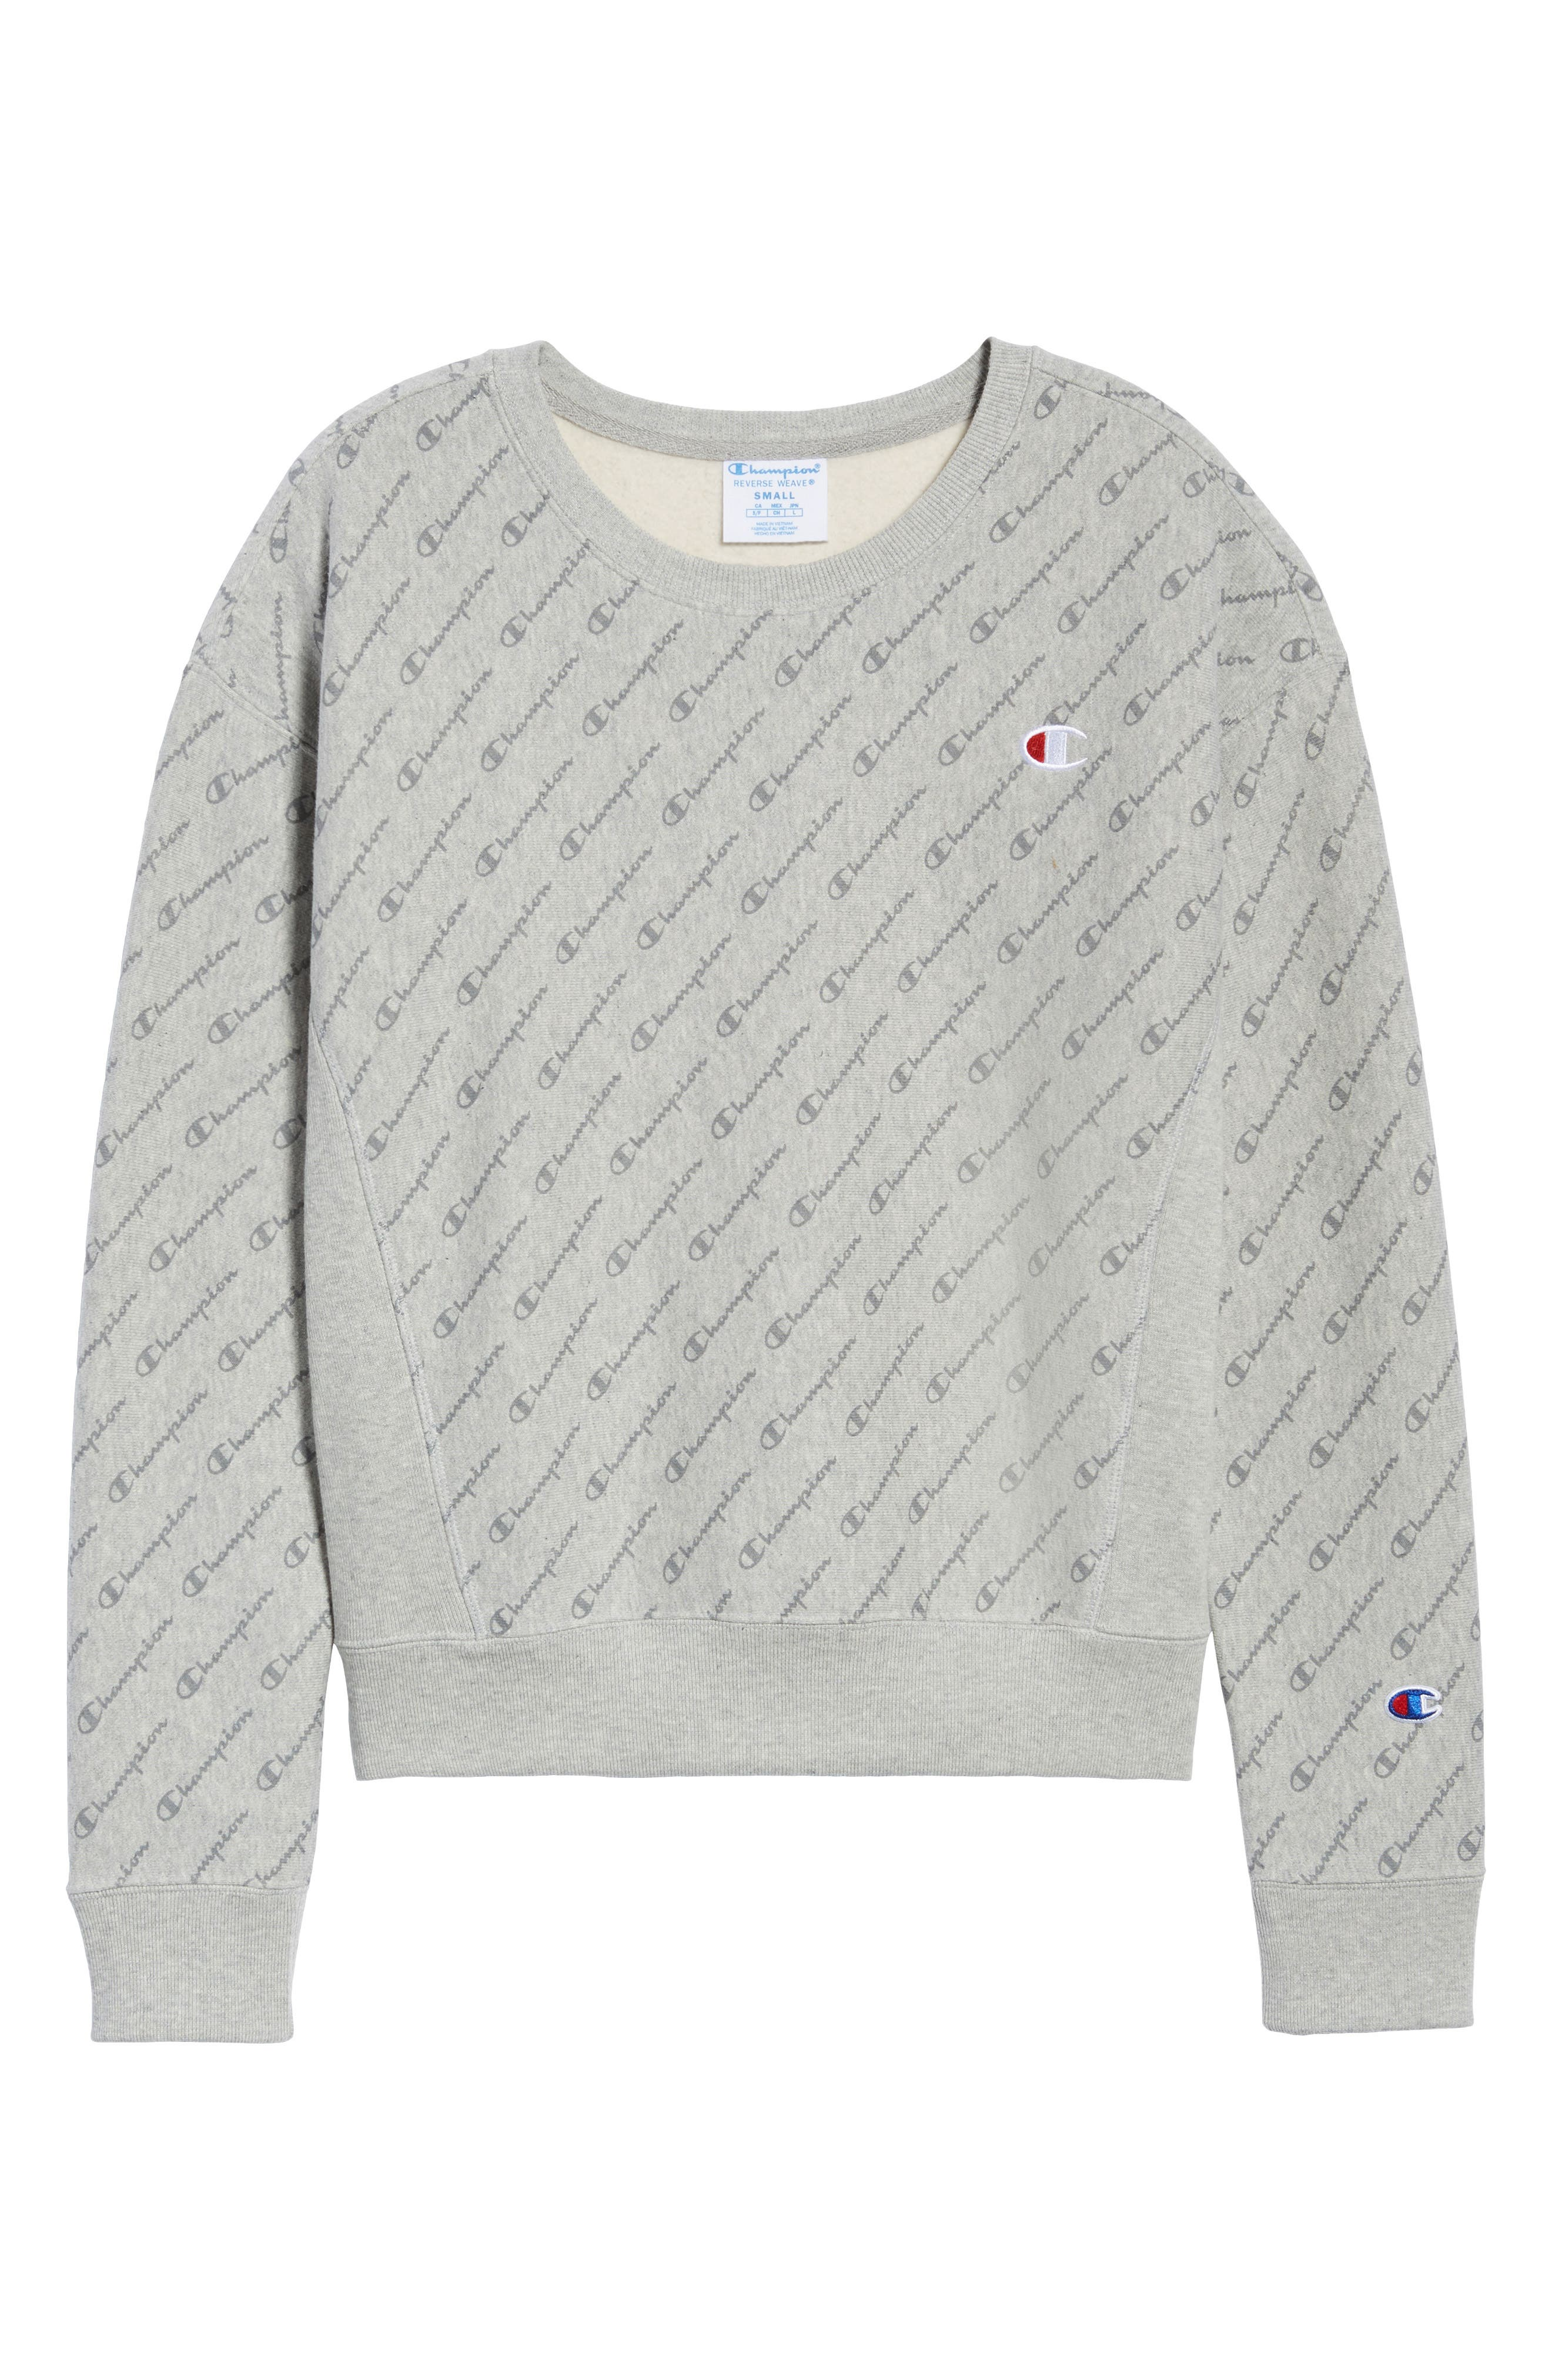 All Over Logo Reverse Weave Sweatshirt,                             Alternate thumbnail 3, color,                             DIAG LOGO SCRIPT HEATHER